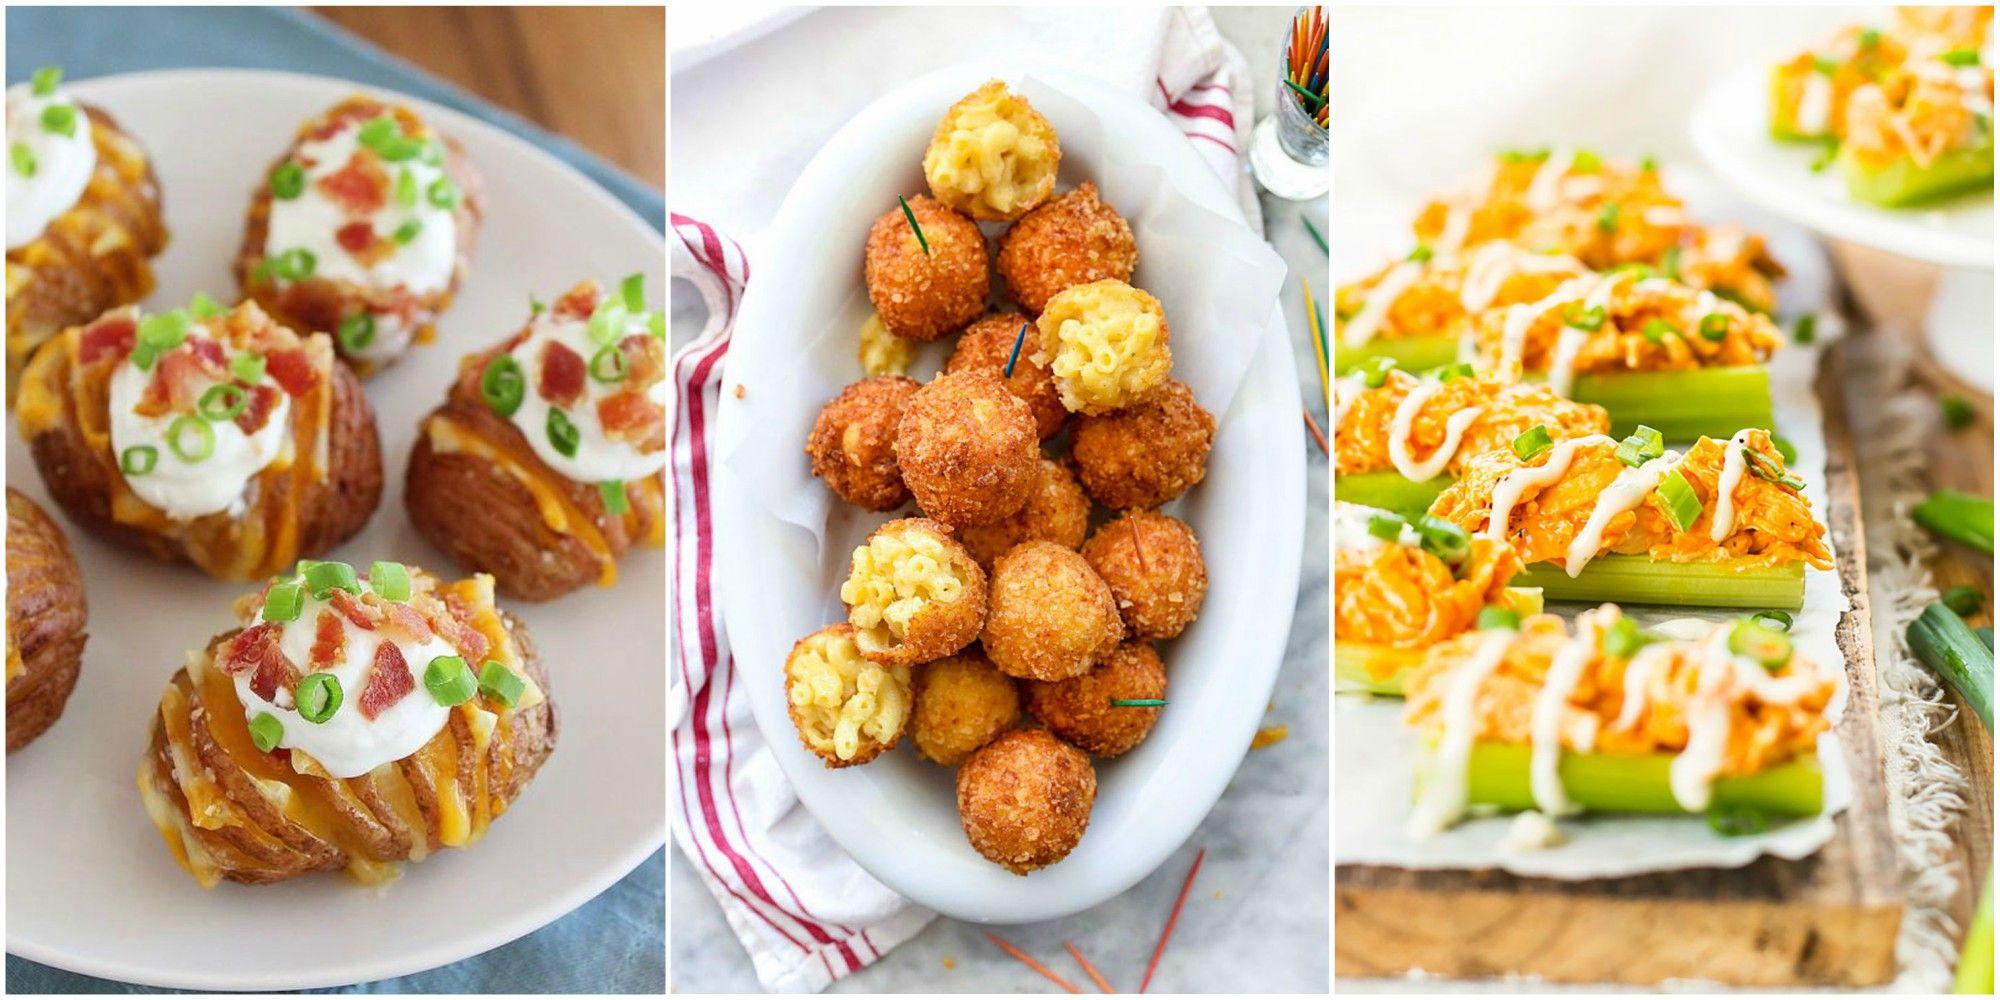 45 best super bowl snacks - appetizer recipes for a super bowl party